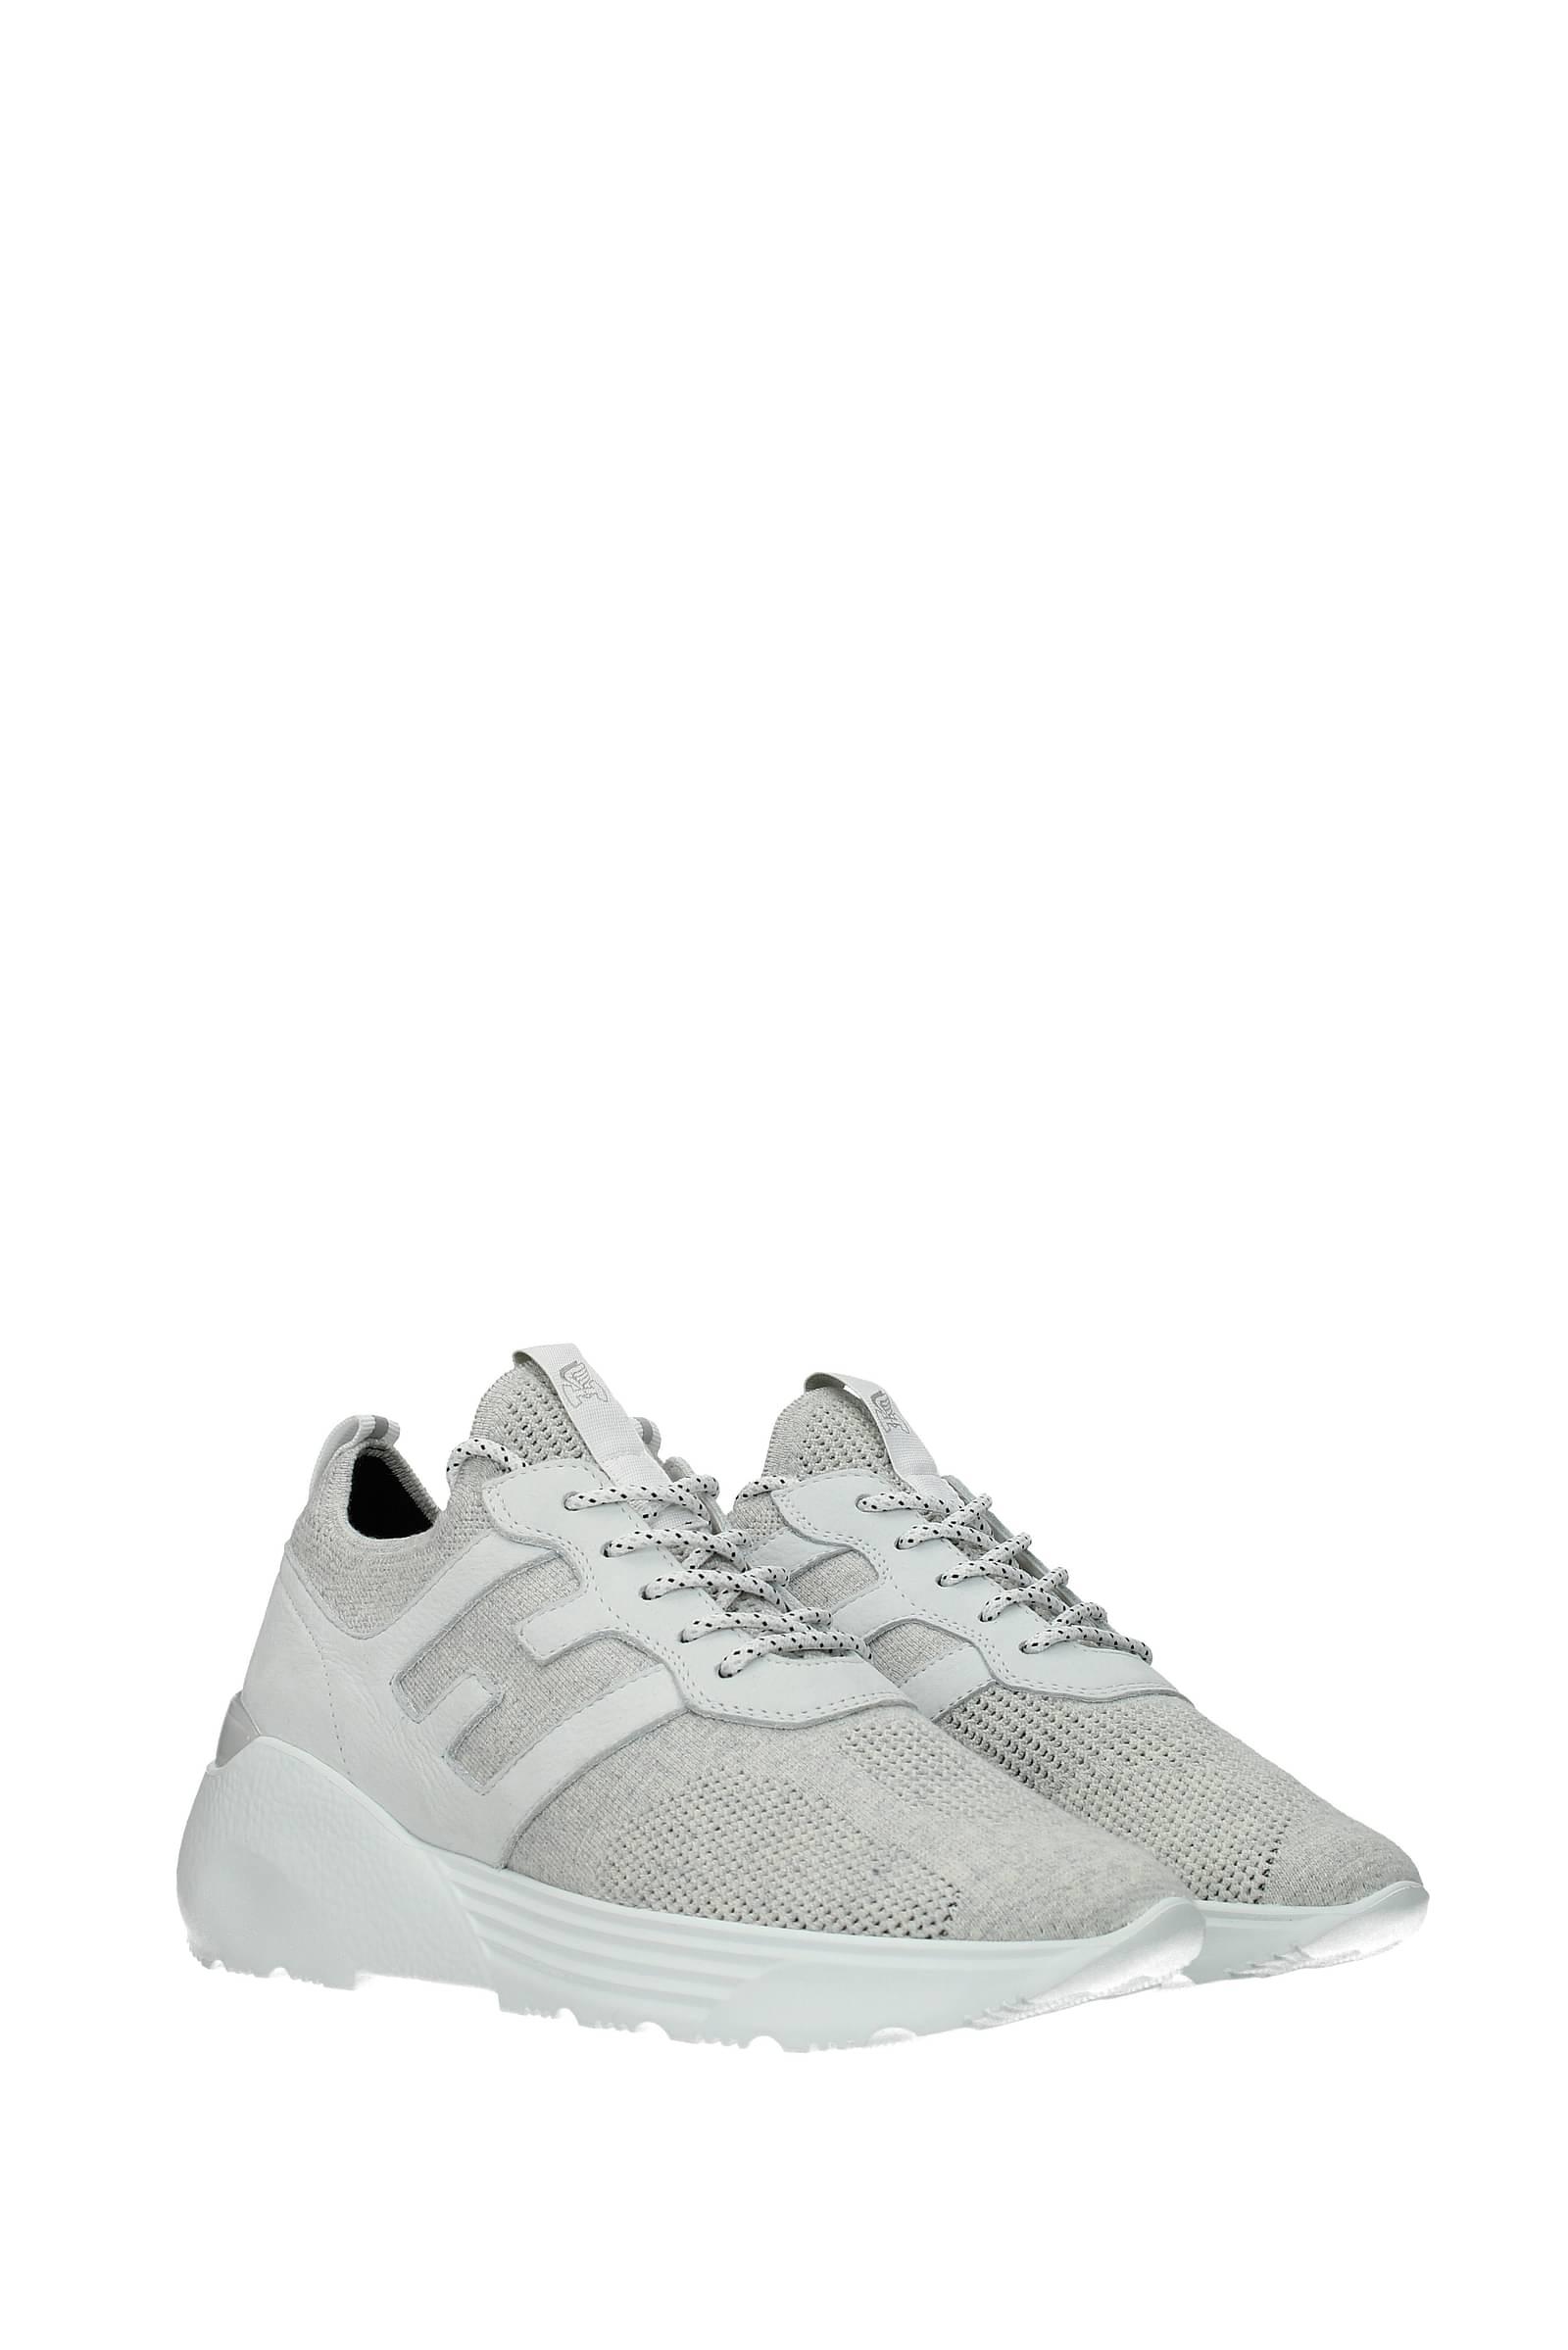 Hogan Sneakers active one Uomo HXM4430CM516RNB001 Tessuto 191,1€